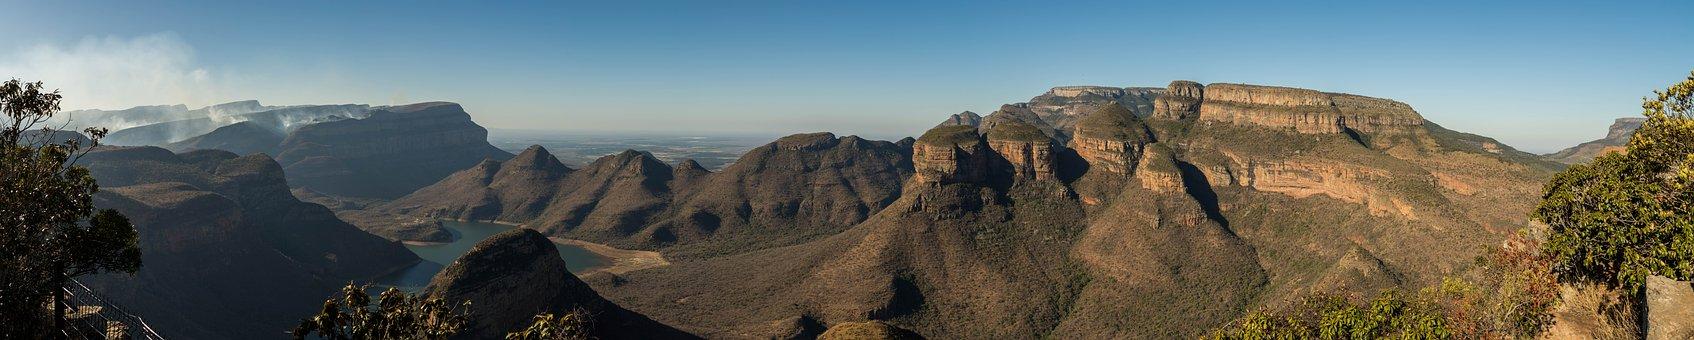 Panorama, Three Rondavels, South Africa, Nature